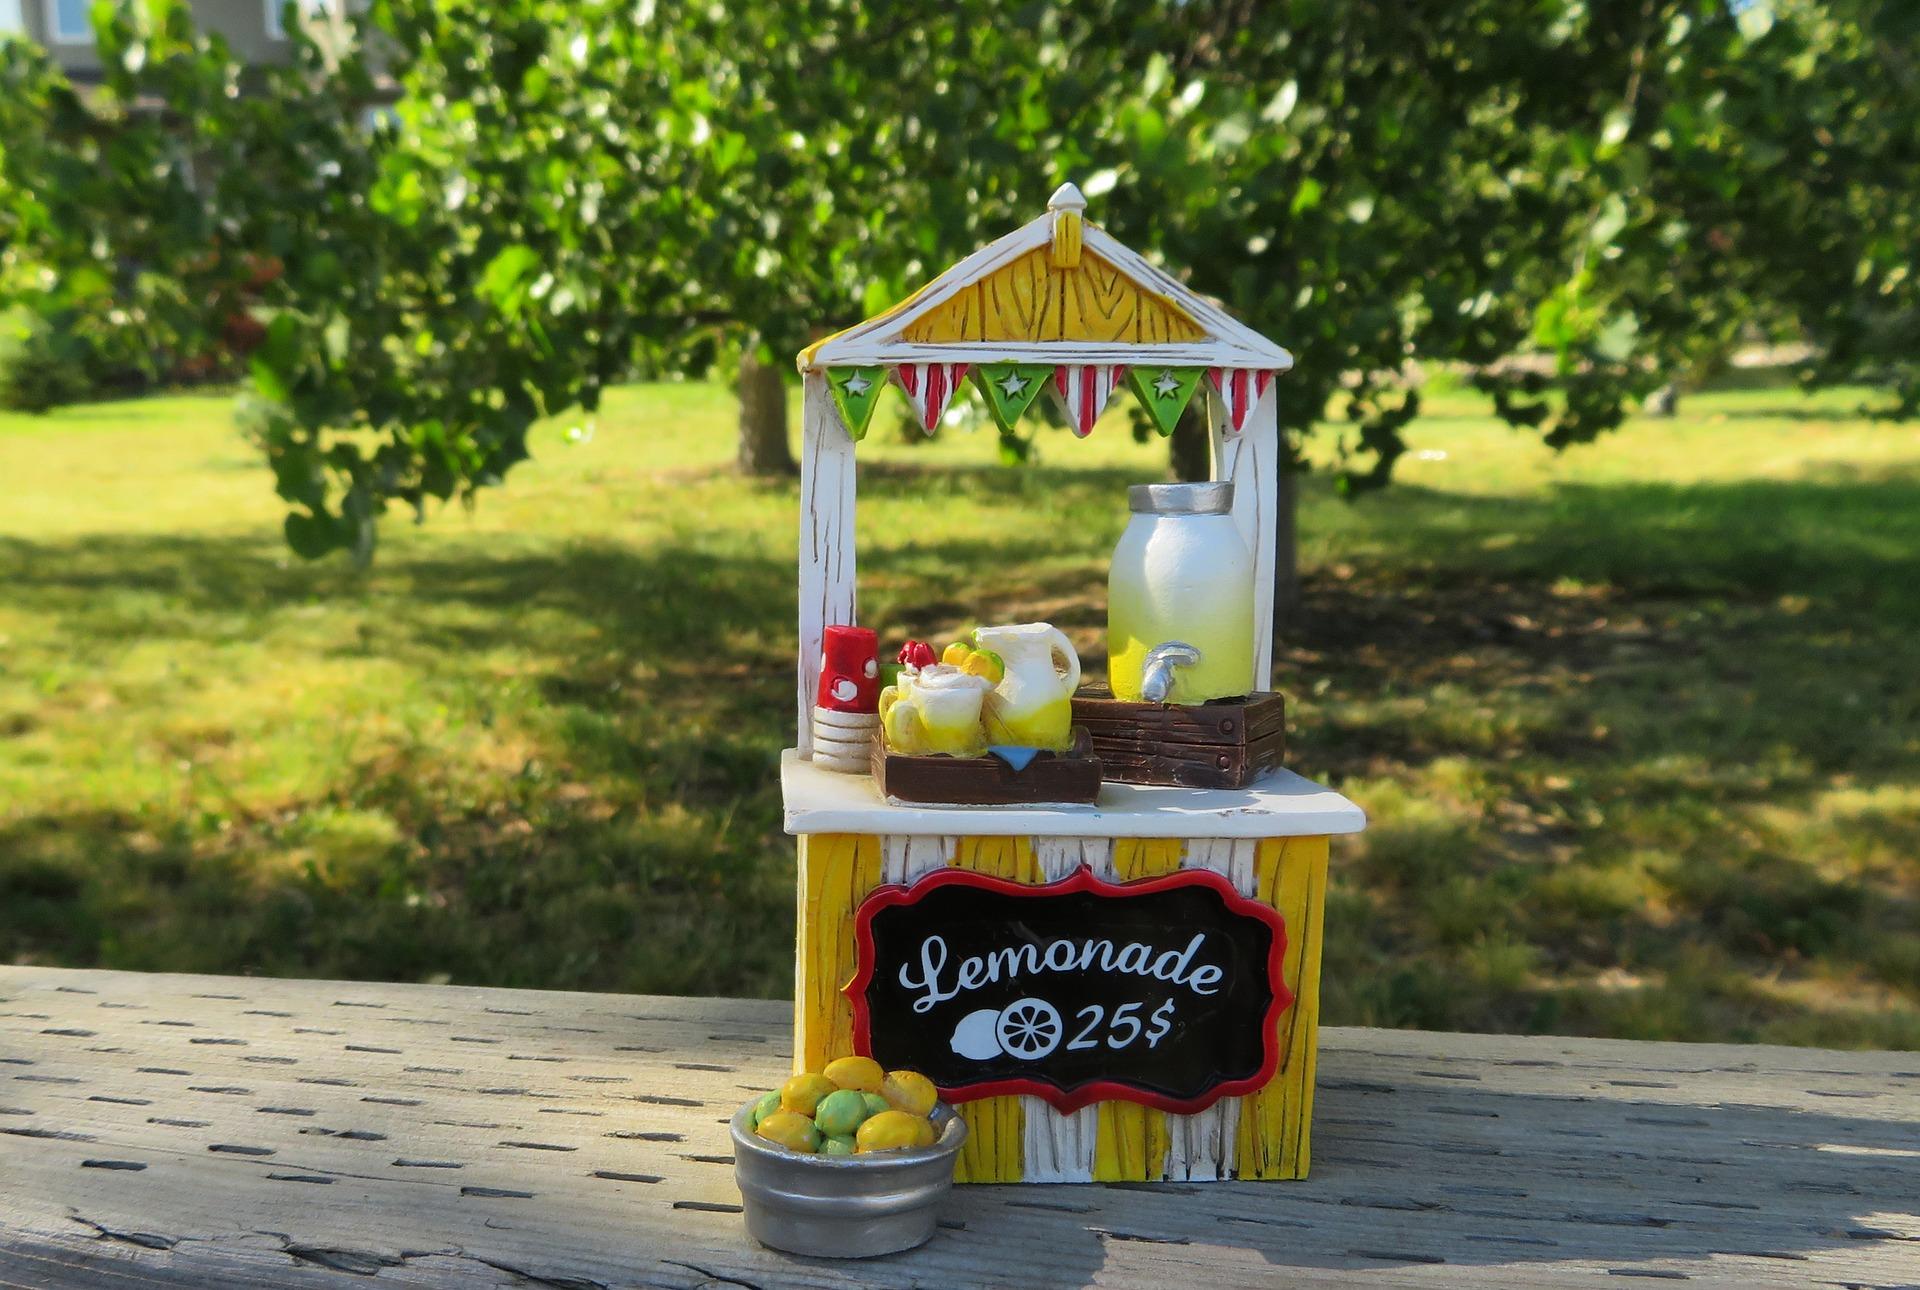 lemonade-stand-2483297_1920.jpg